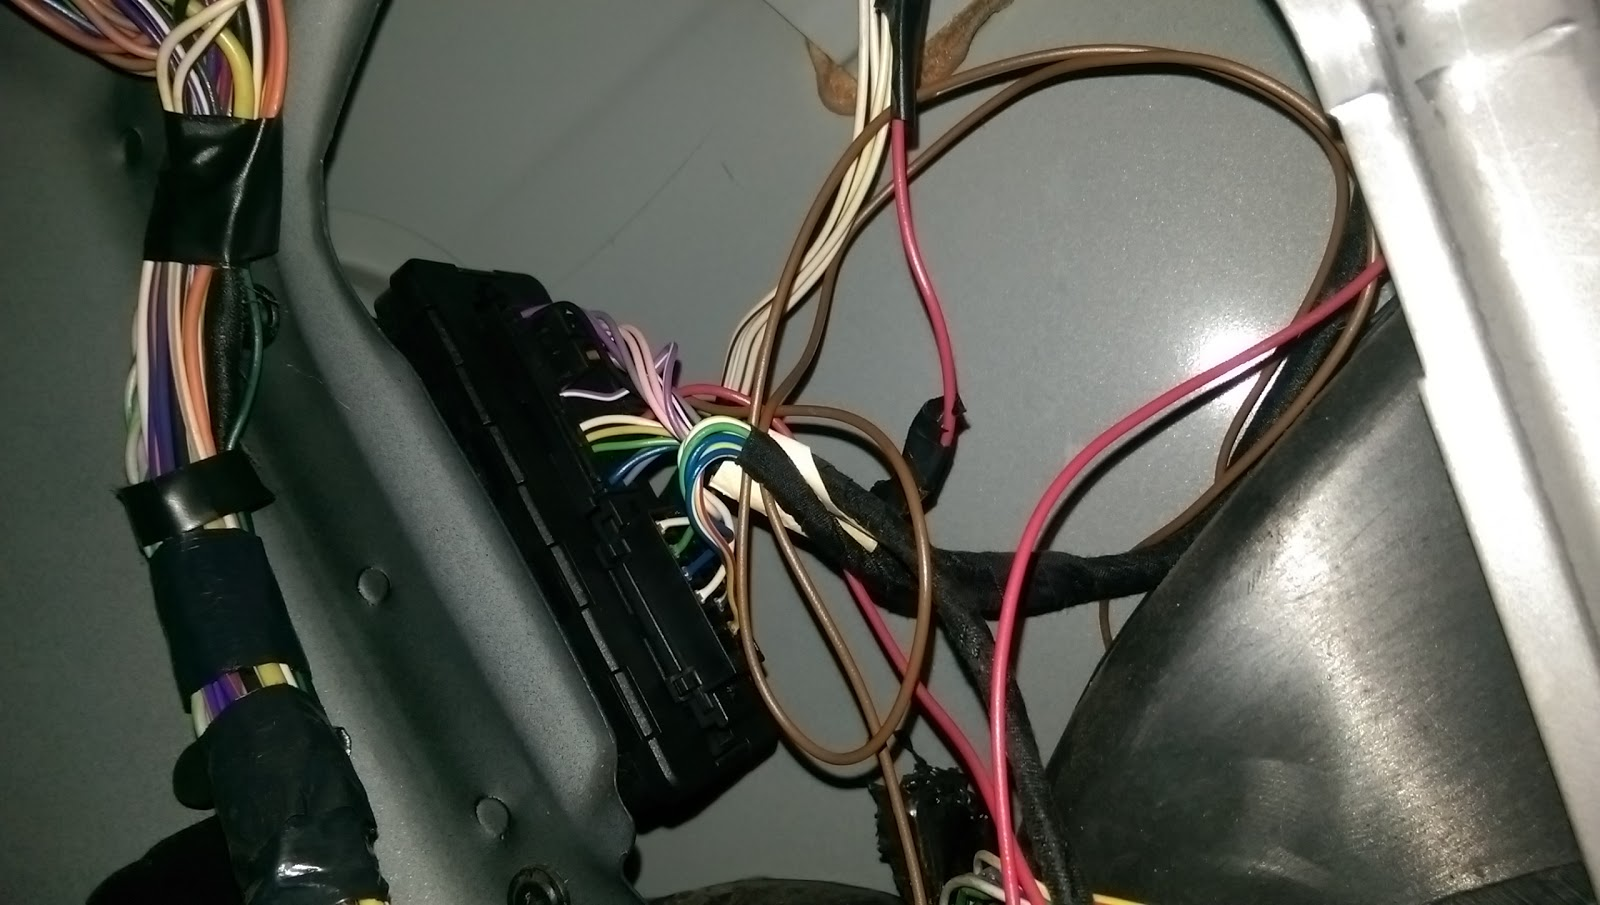 Stupendous Dashcam Reversing Camera To Chrysler Grand Voyager Wiring 101 Swasaxxcnl